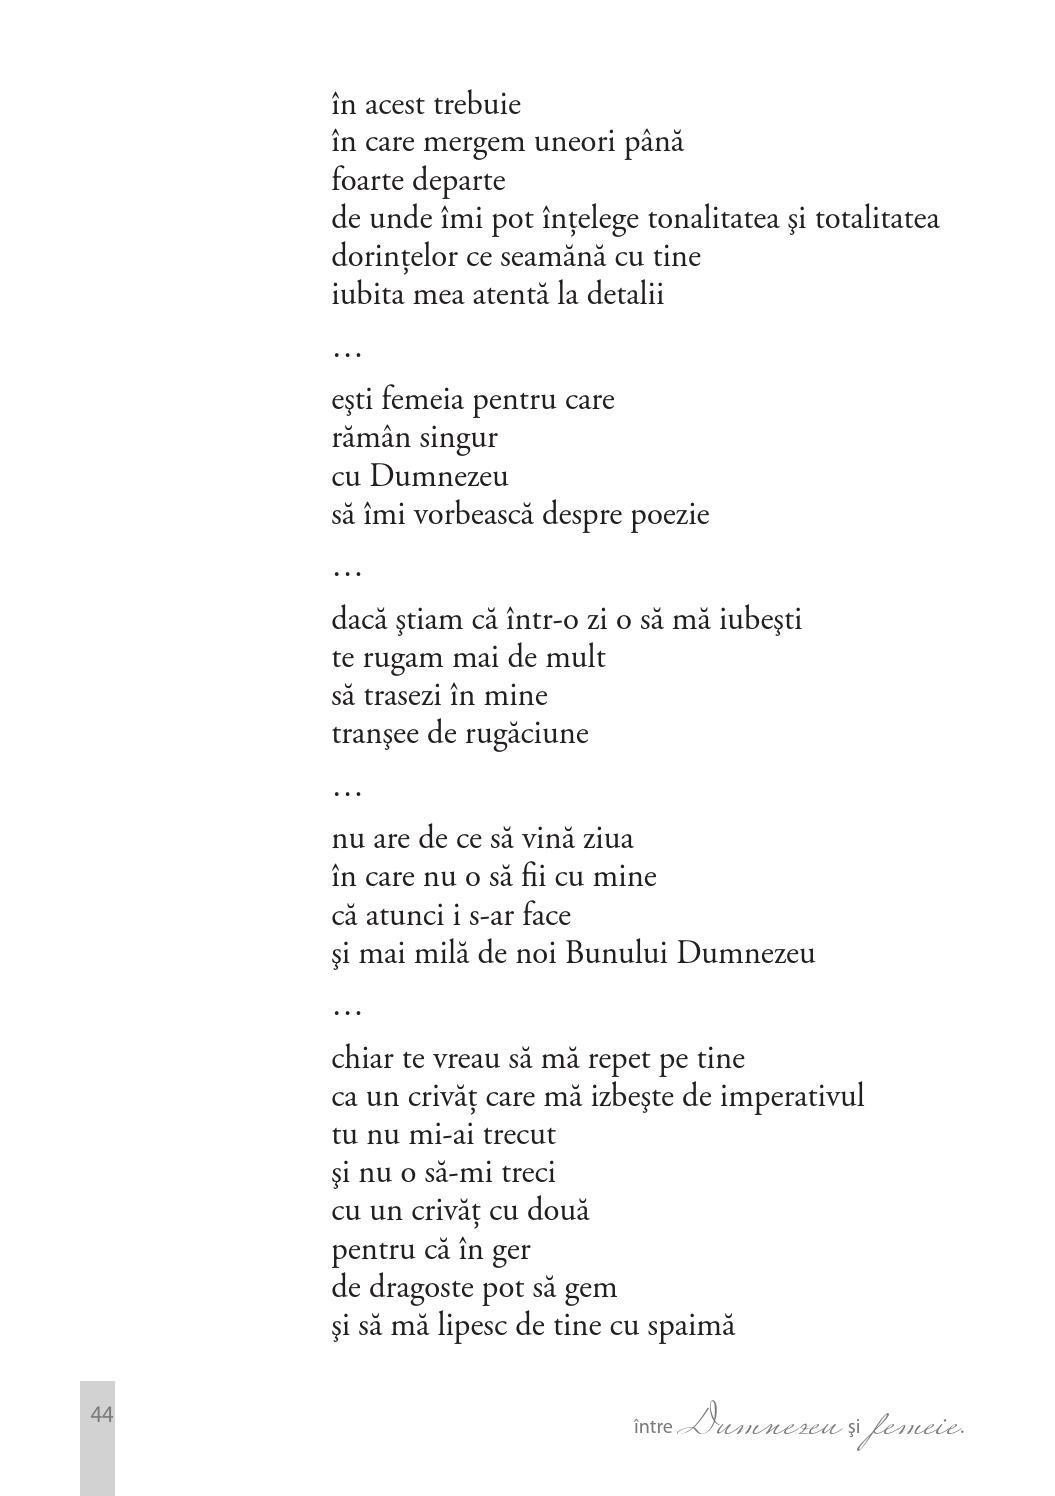 Intalnirea cu o singura femeie in Maroc)